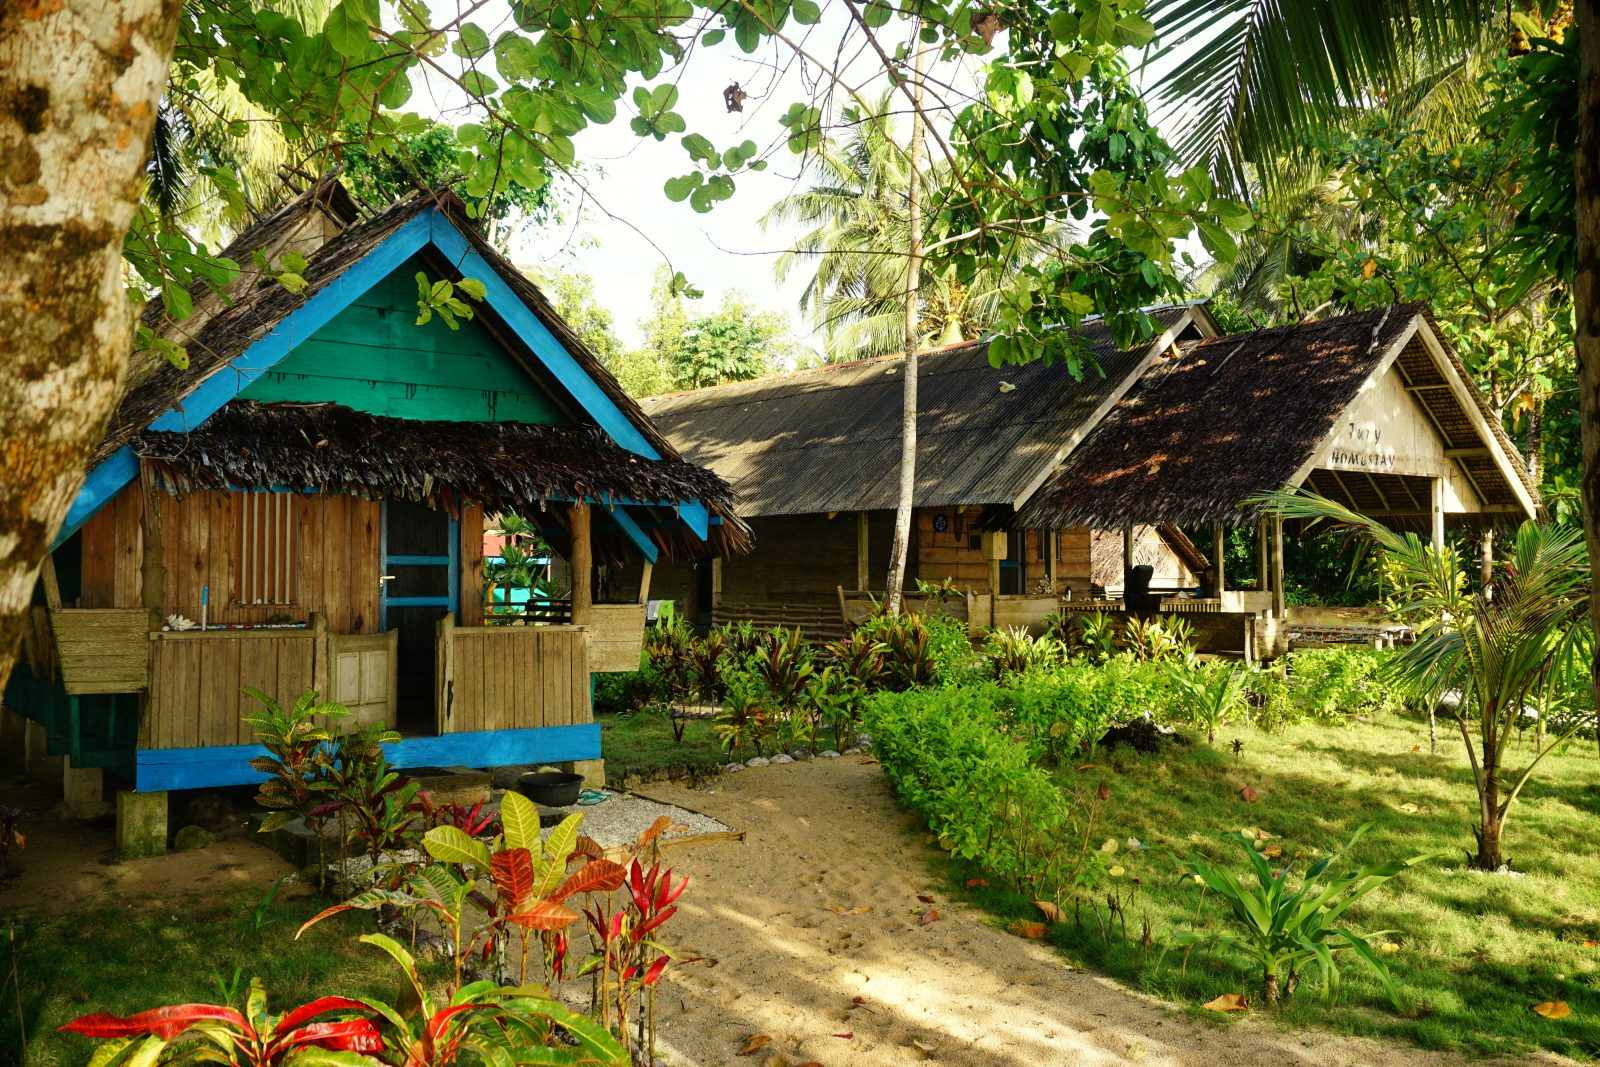 Surfing mentawai island beng beng nyang masokut jupy surf camp indonesia trip jupys